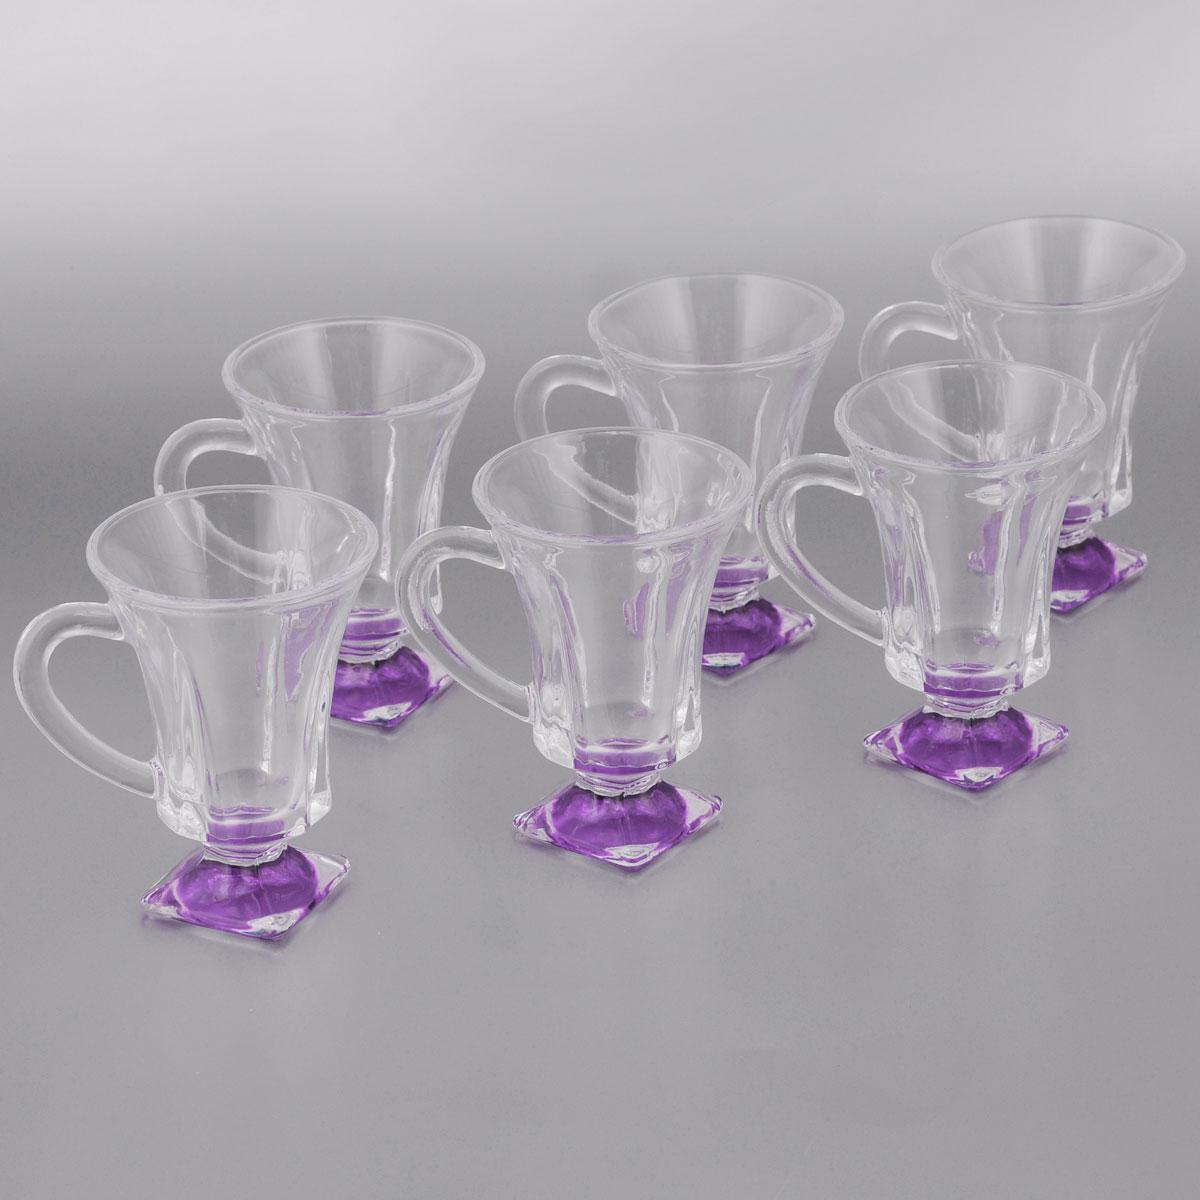 цены на Набор стаканов для глинтвейна